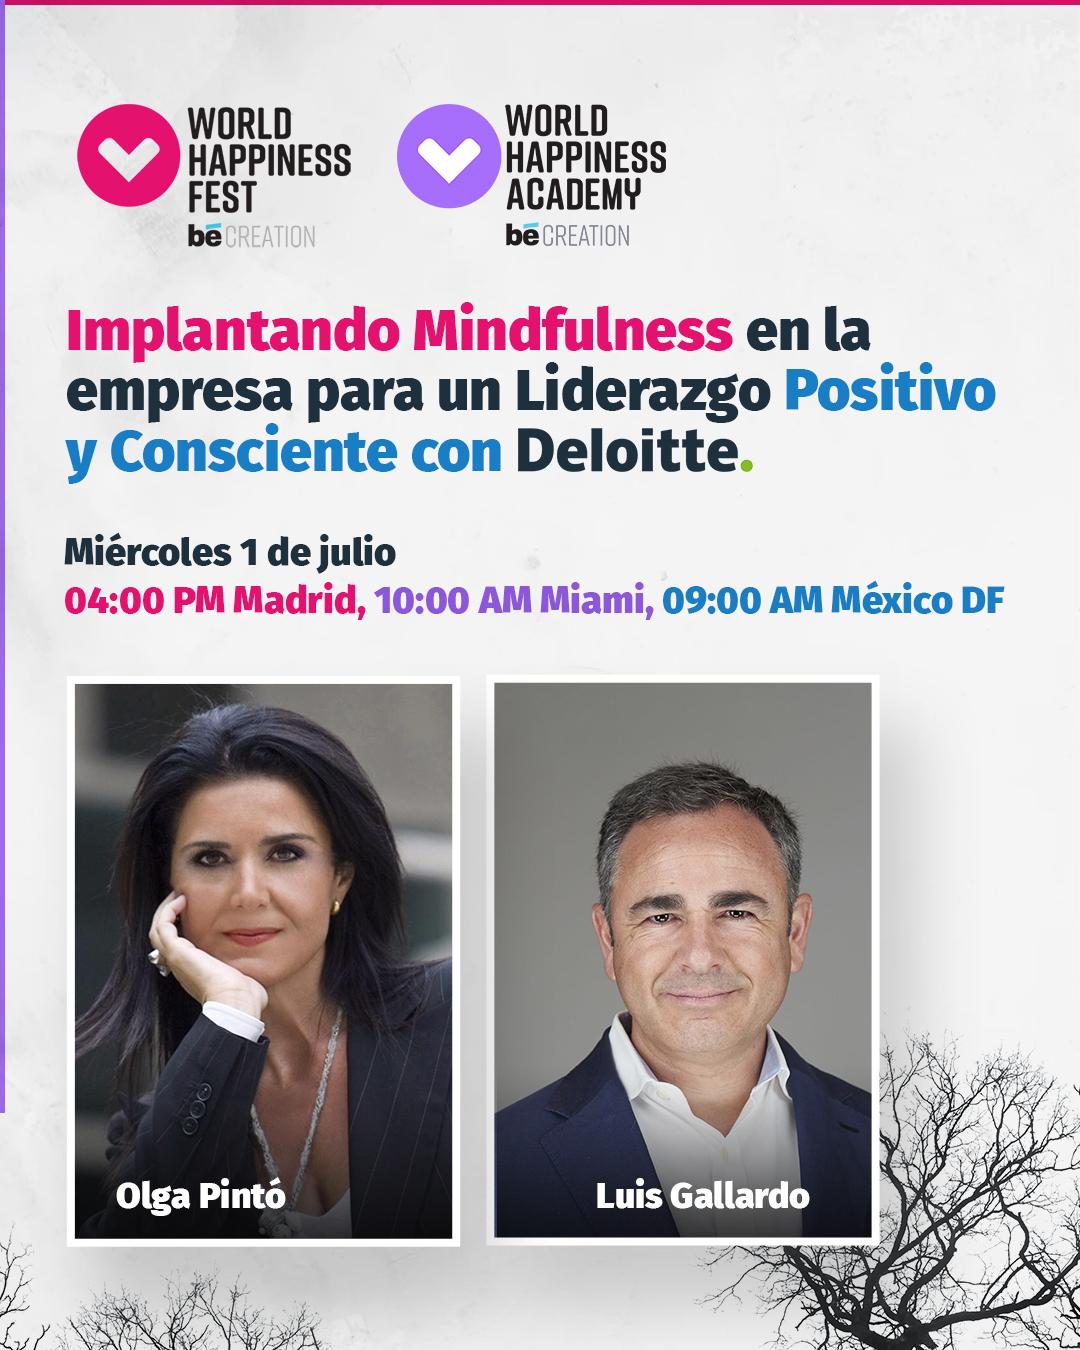 Implantando Mindfulness en la Empresa